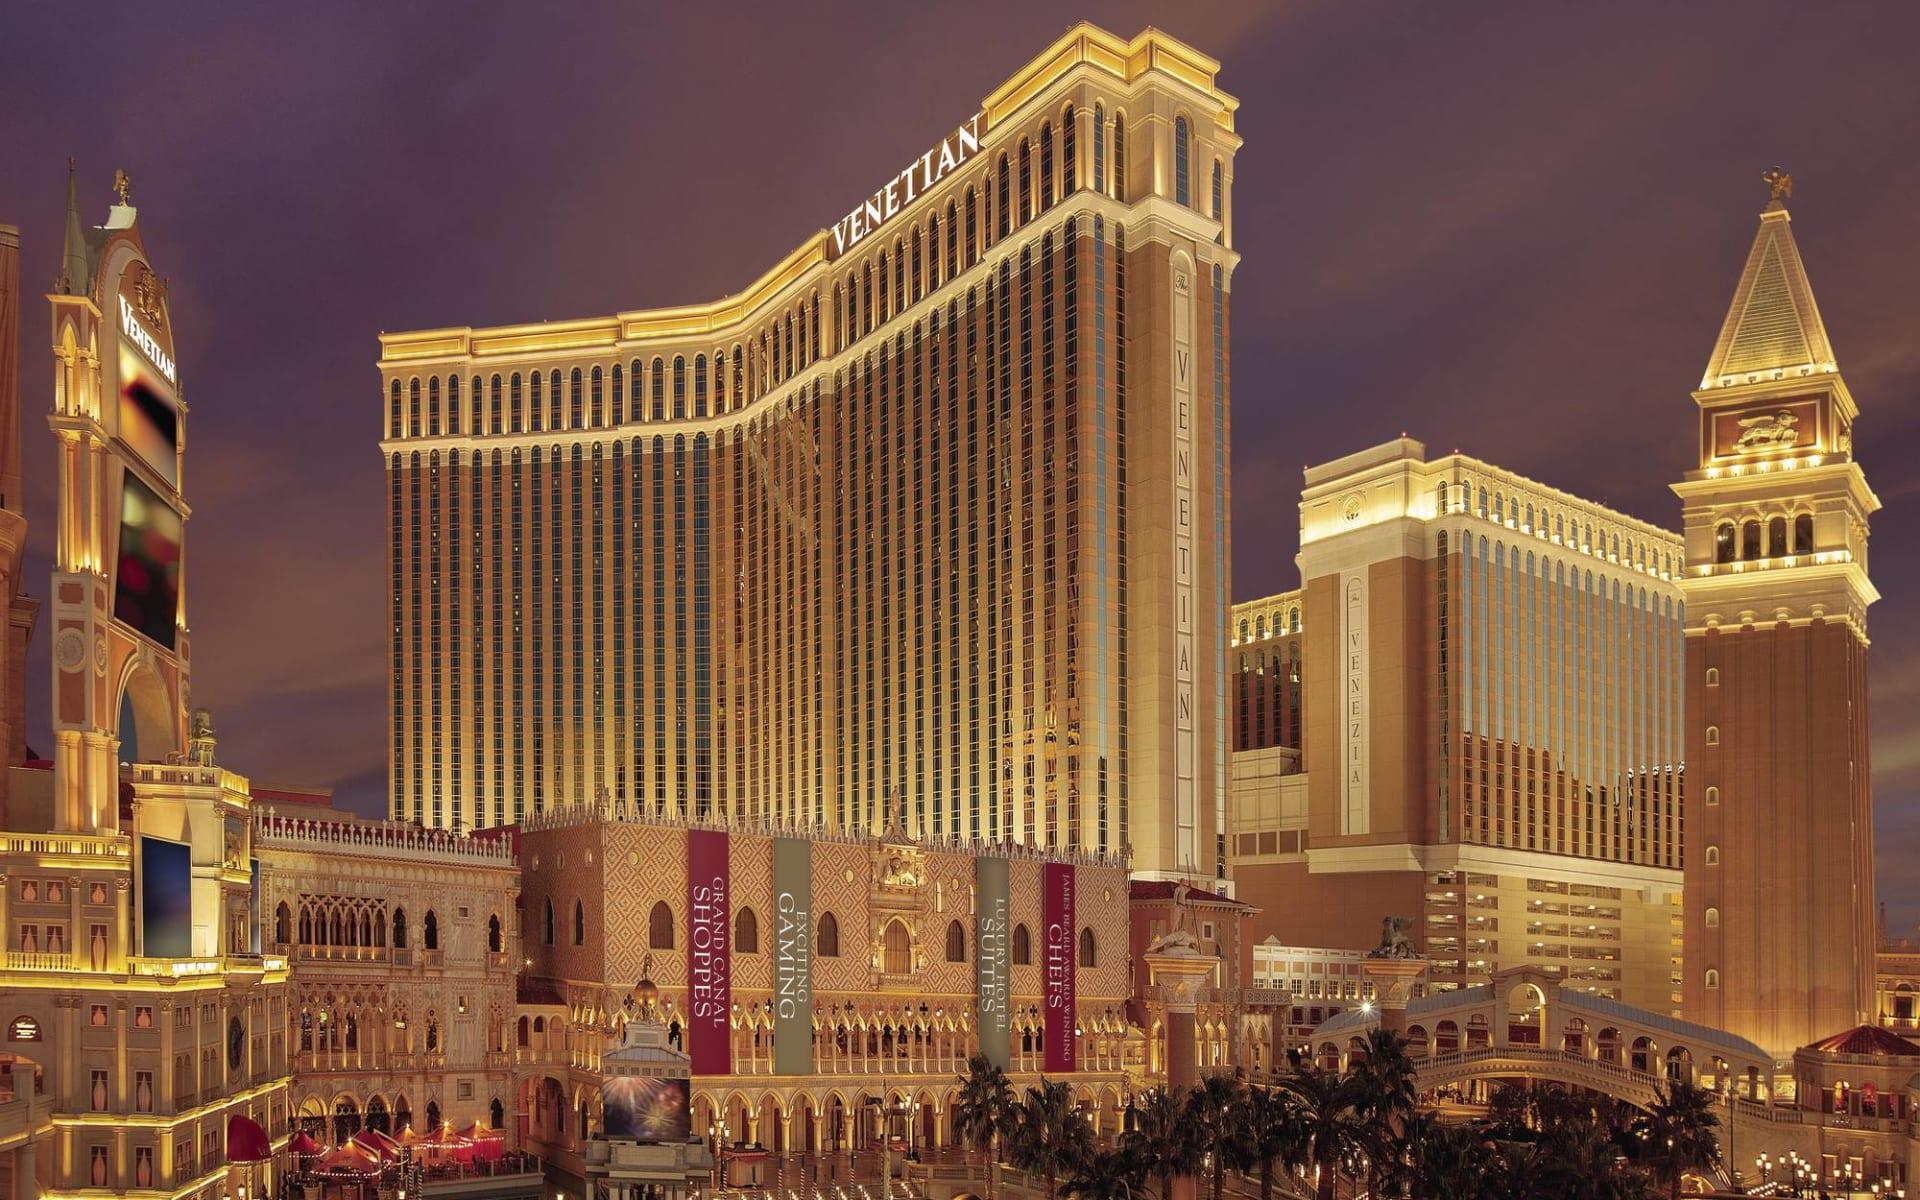 The Venetian Resort & Casino in Las Vegas: exterior the venetian resort and casino hotelanlage bei nacht